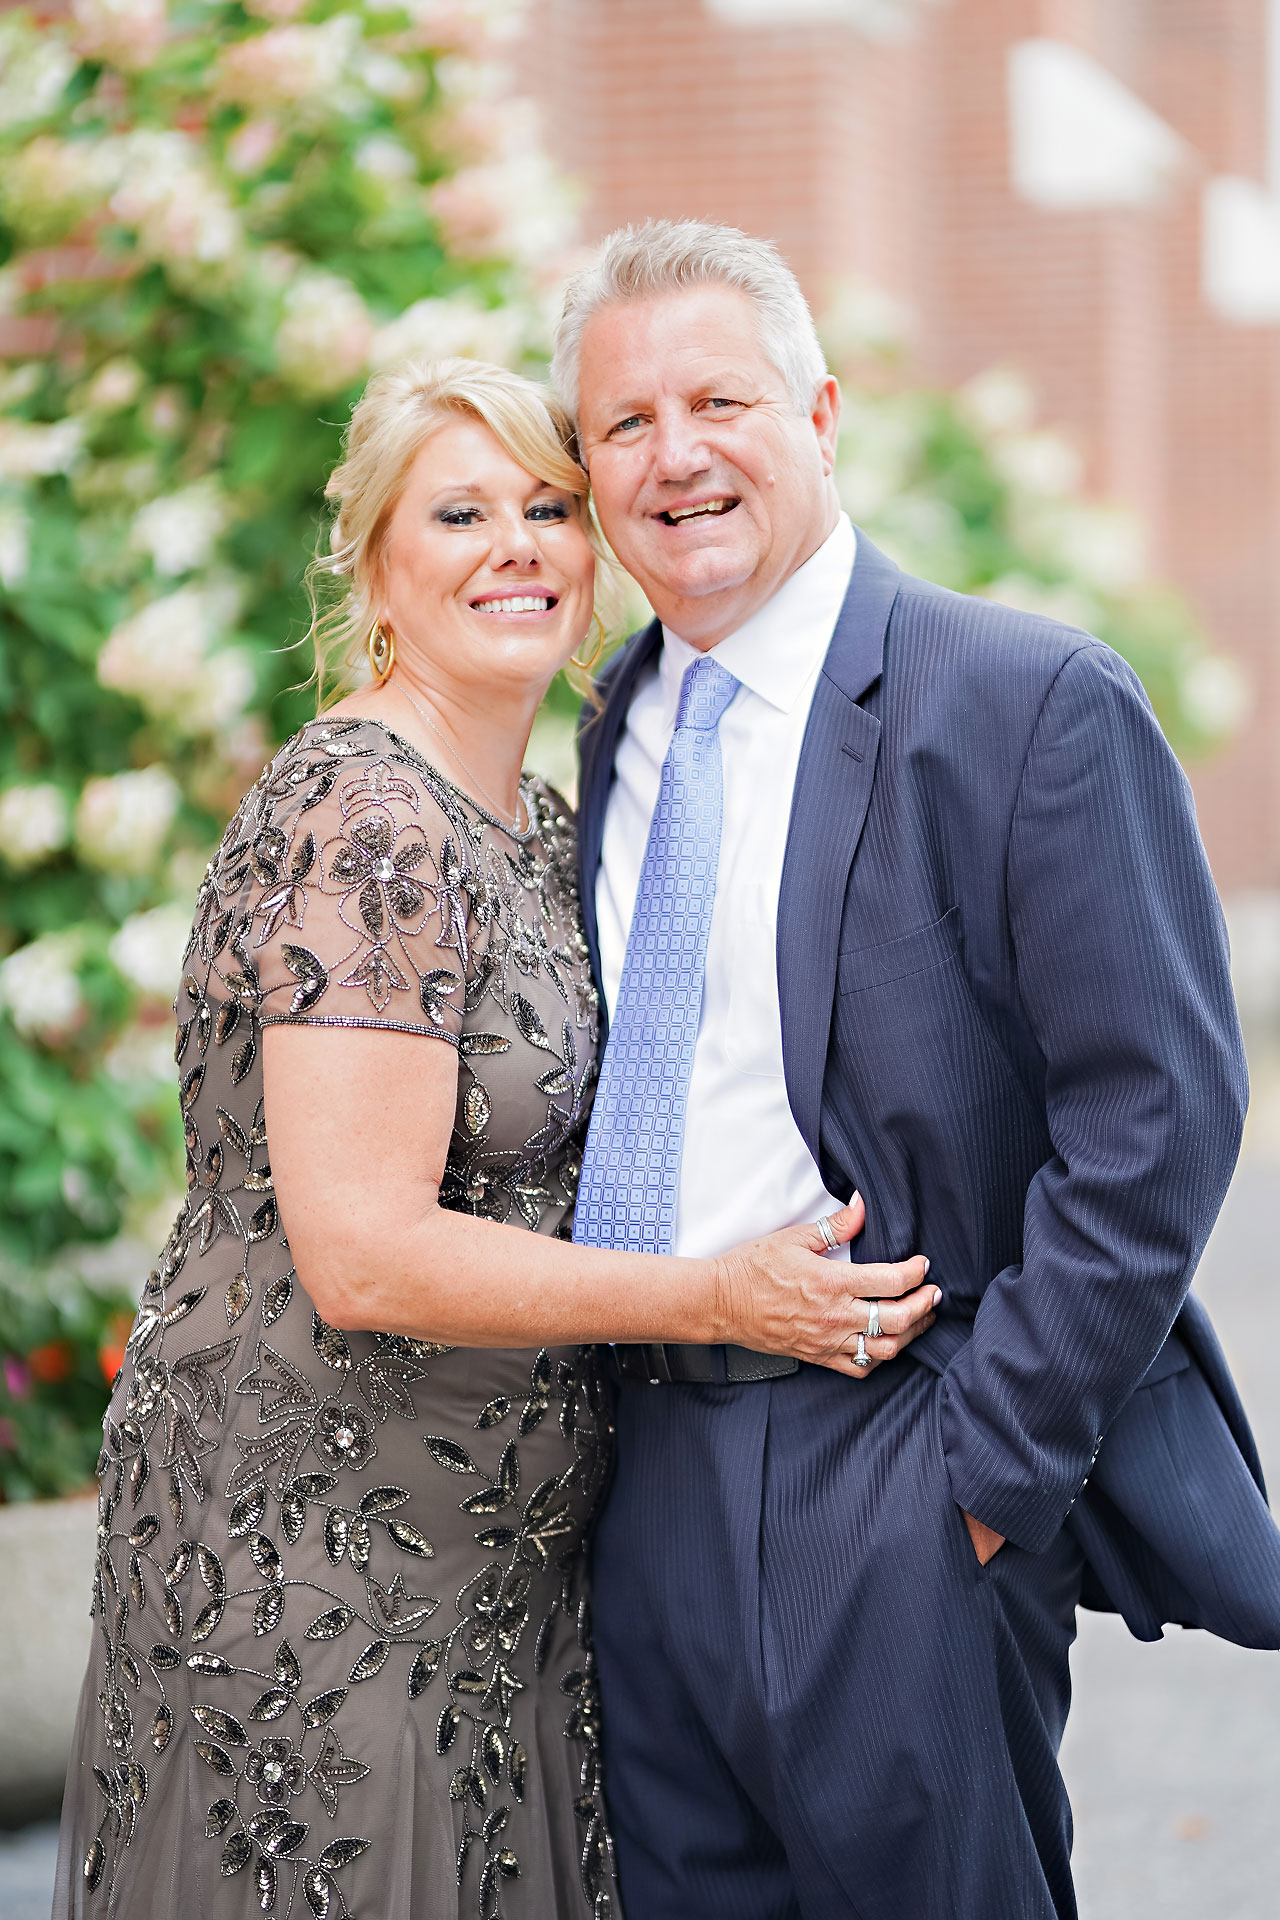 Sammi Jack Regions Tower JPS Events Indianapolis Wedding 127